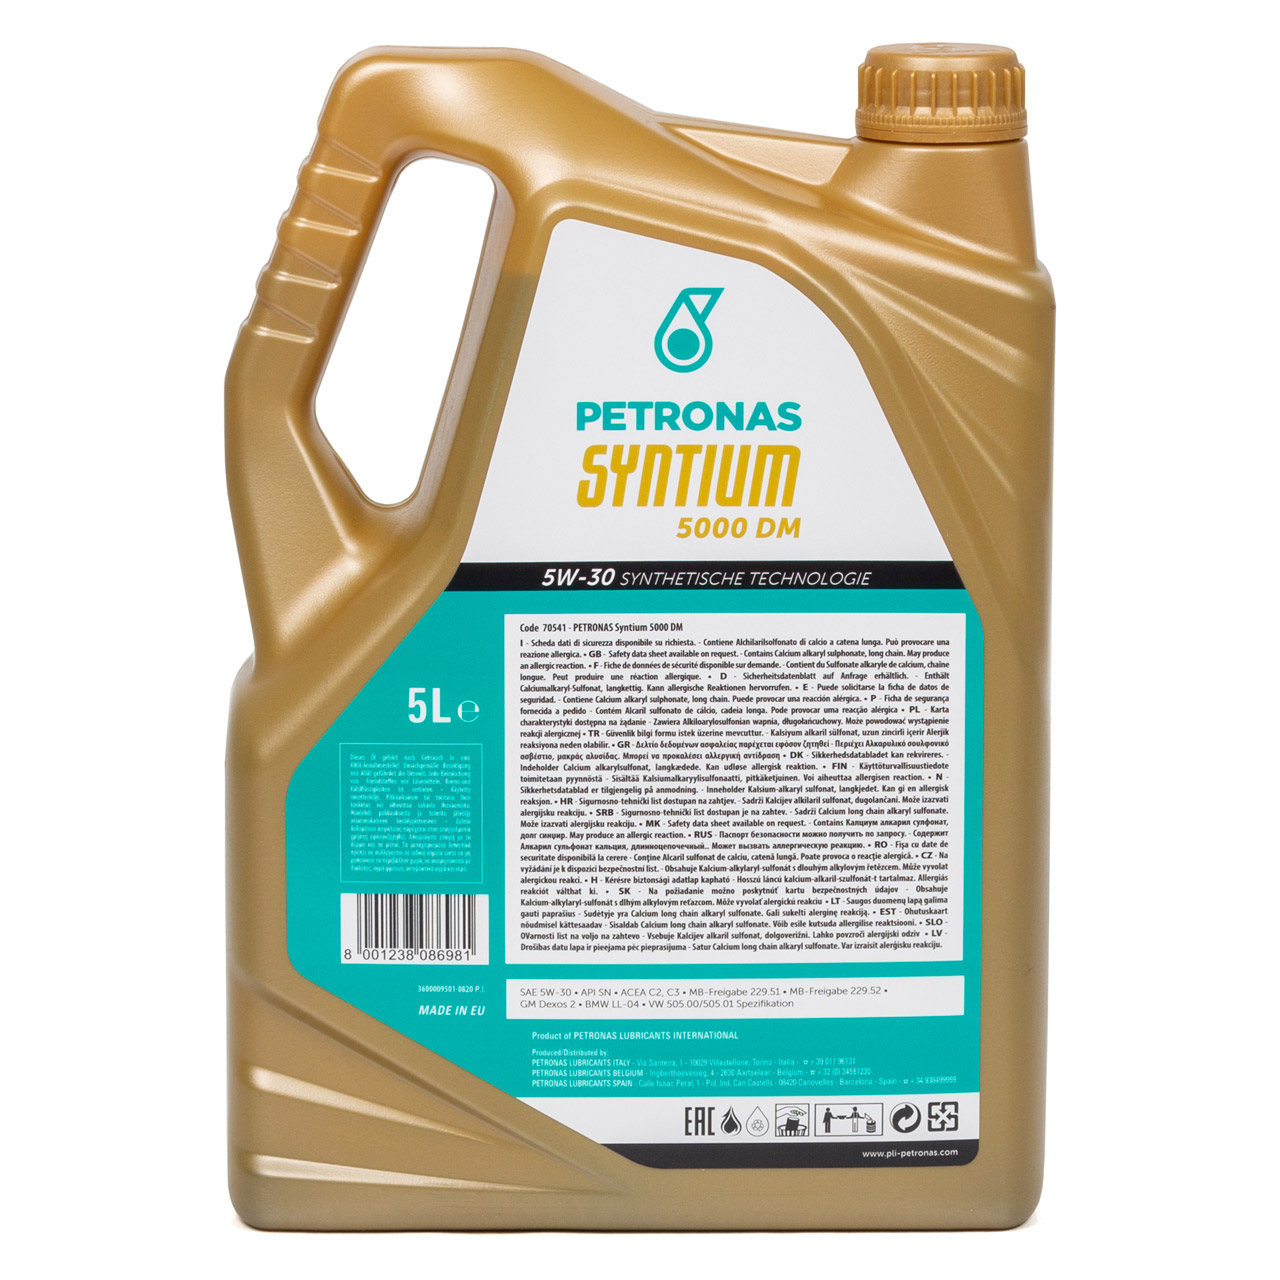 PETRONAS SYNTIUM 5000 DM Motoröl Öl 5W30 MB 229.51/52 VW 505.00/01 - 5L 5 Liter